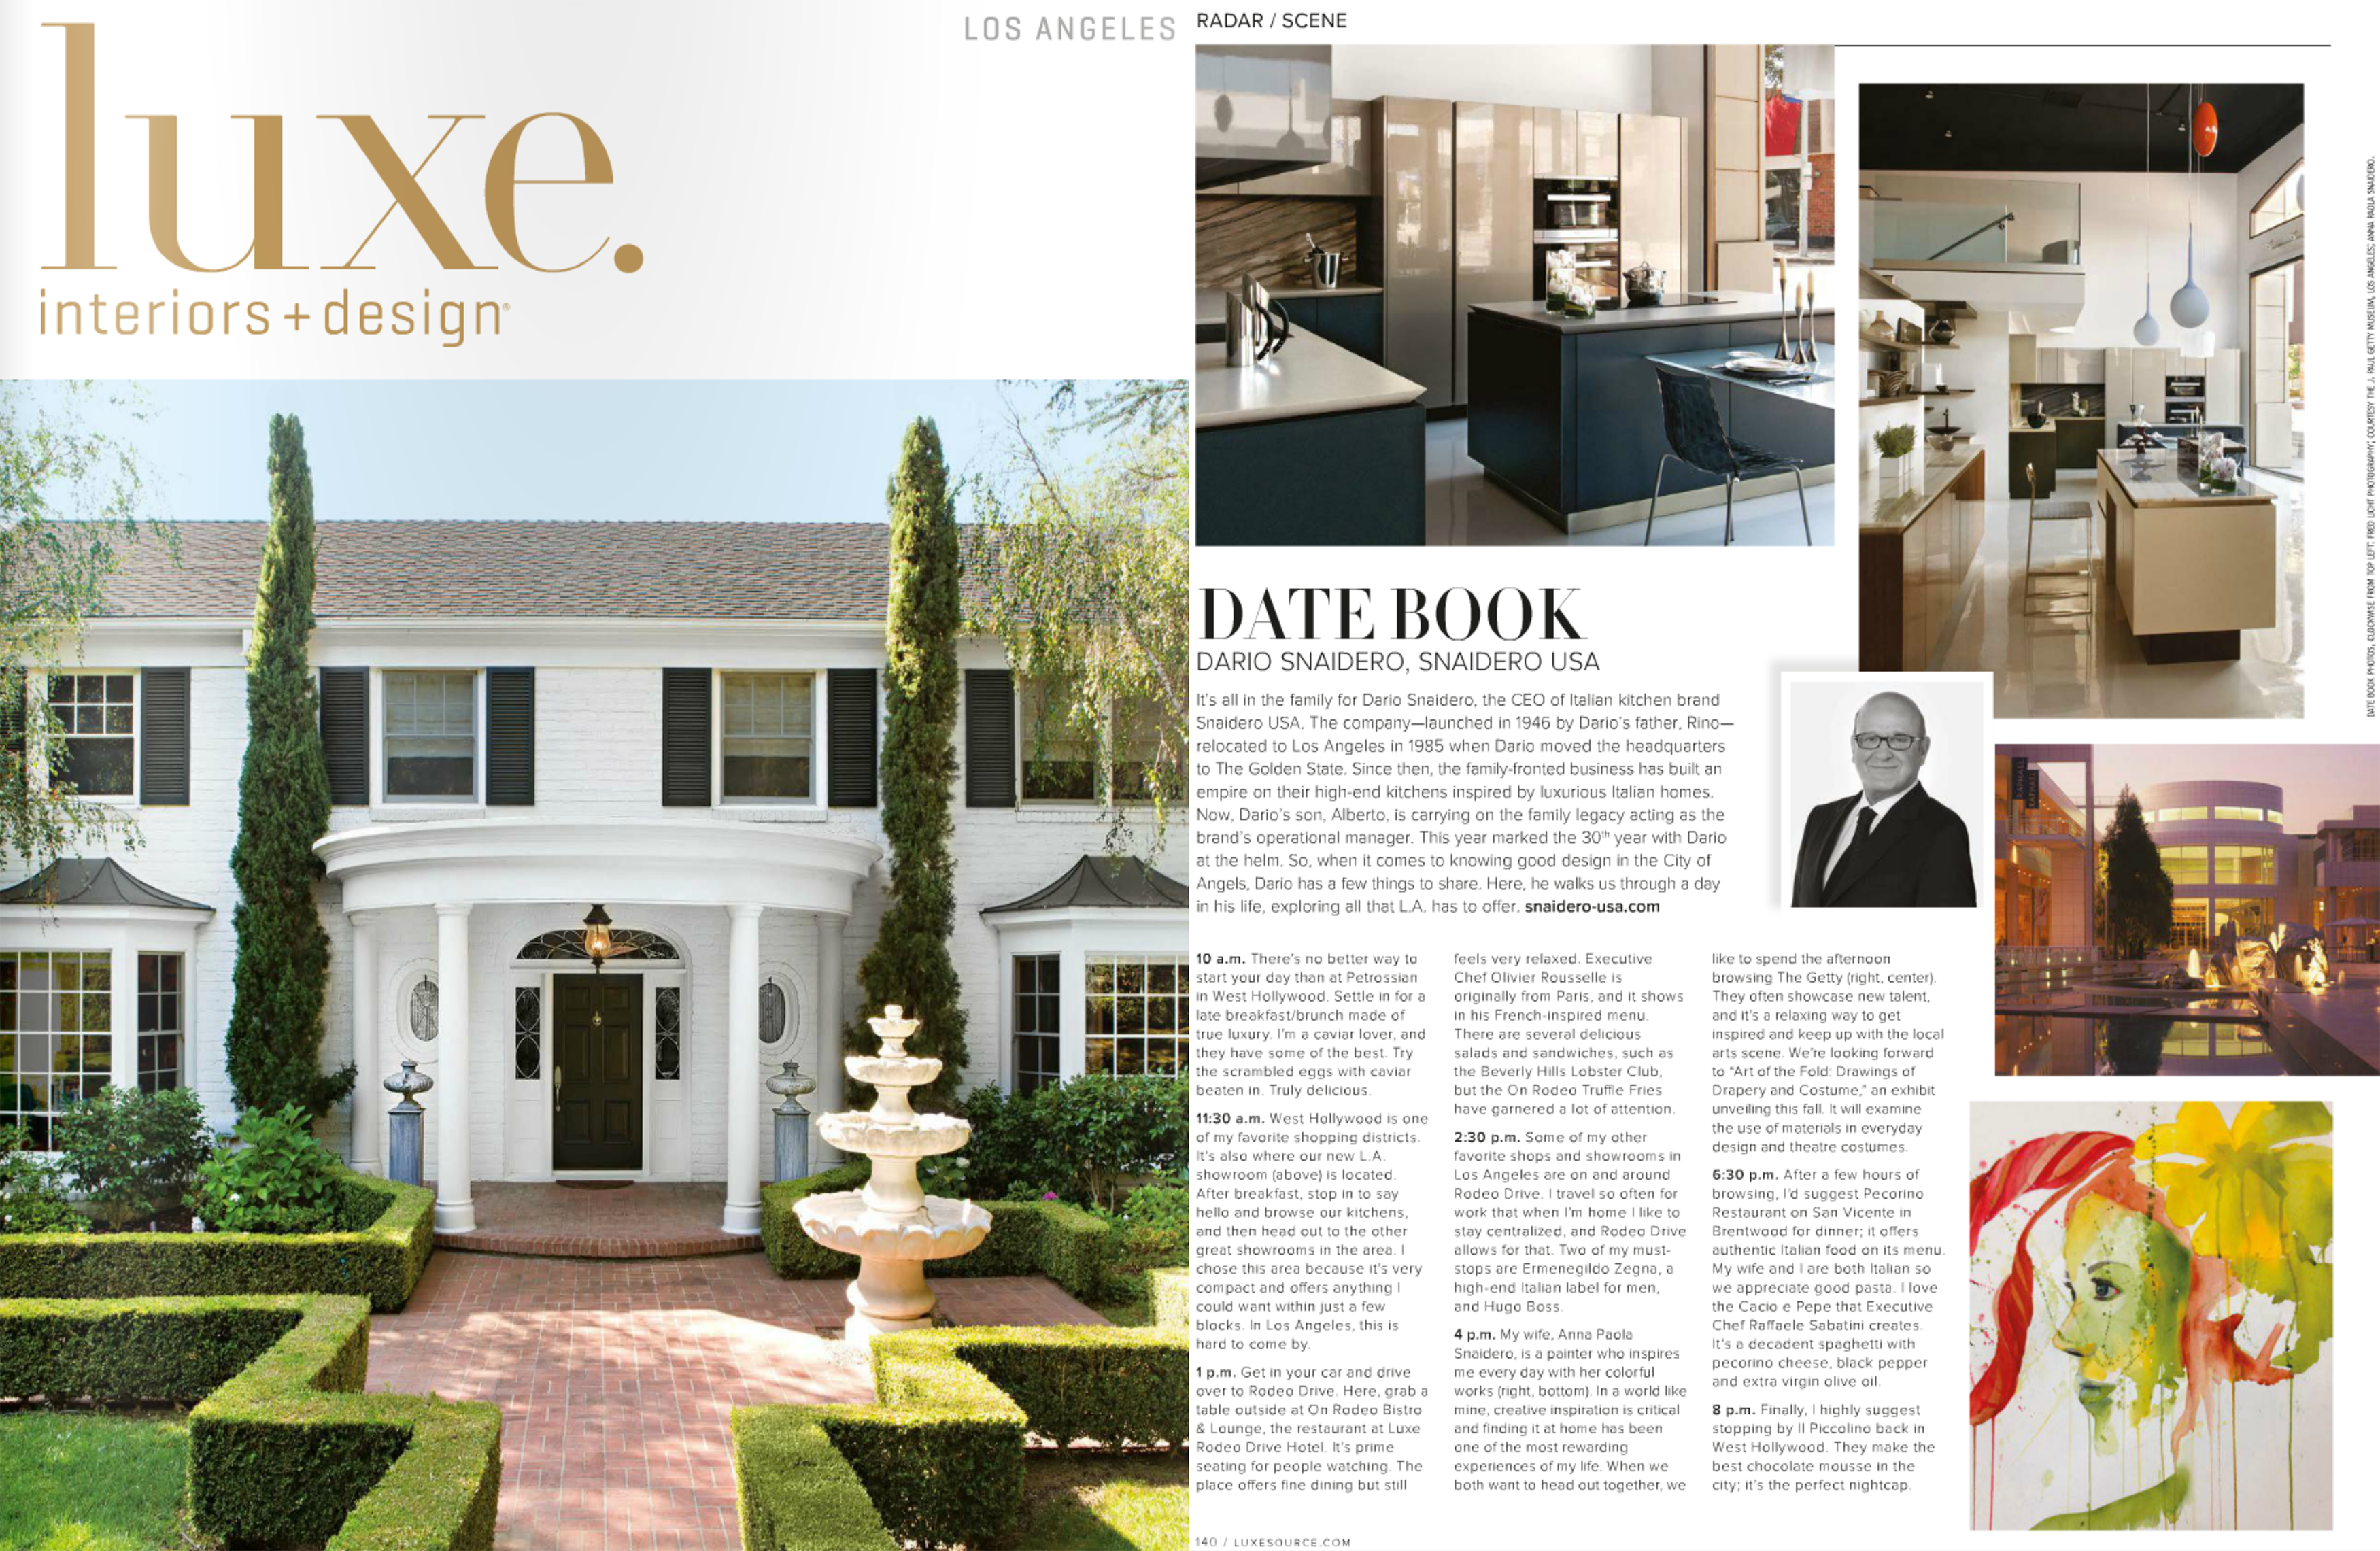 2015 LUXE Magazine Interior Design Los Angeles Featuring Dario Snaidero CEO Of USA